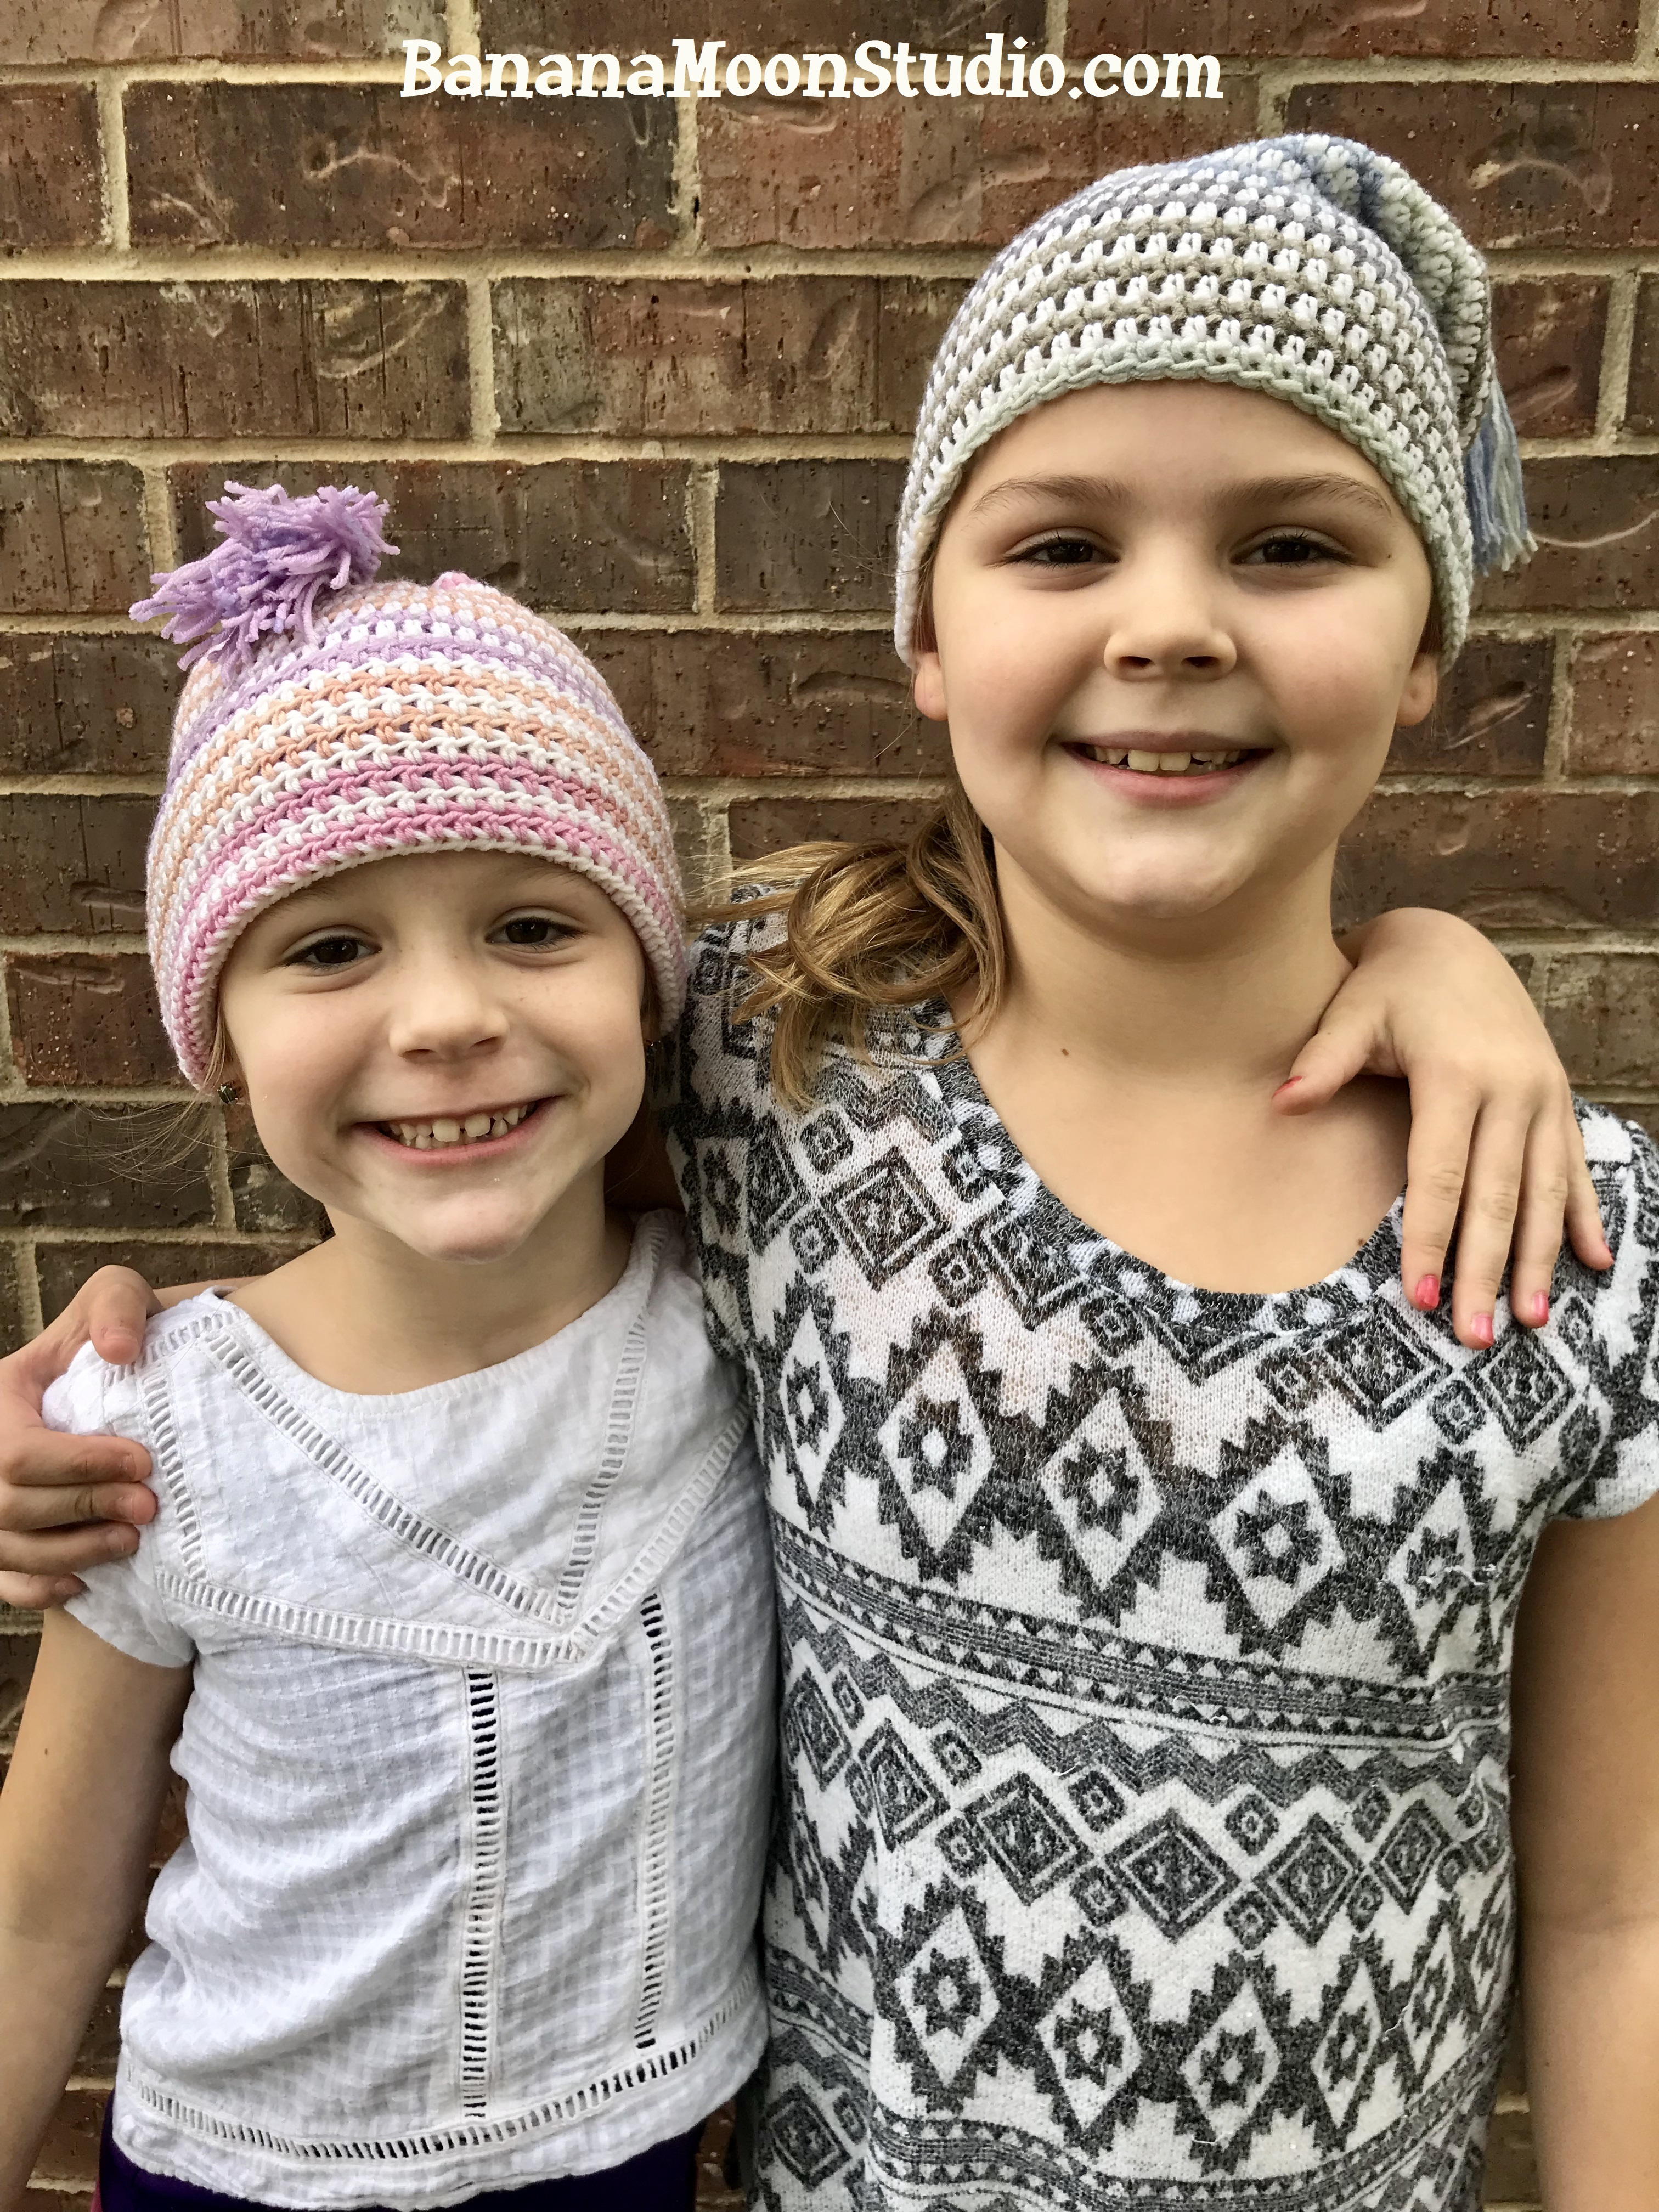 Free crochet pattern slouch hat with tassel from Banana Moon Studio